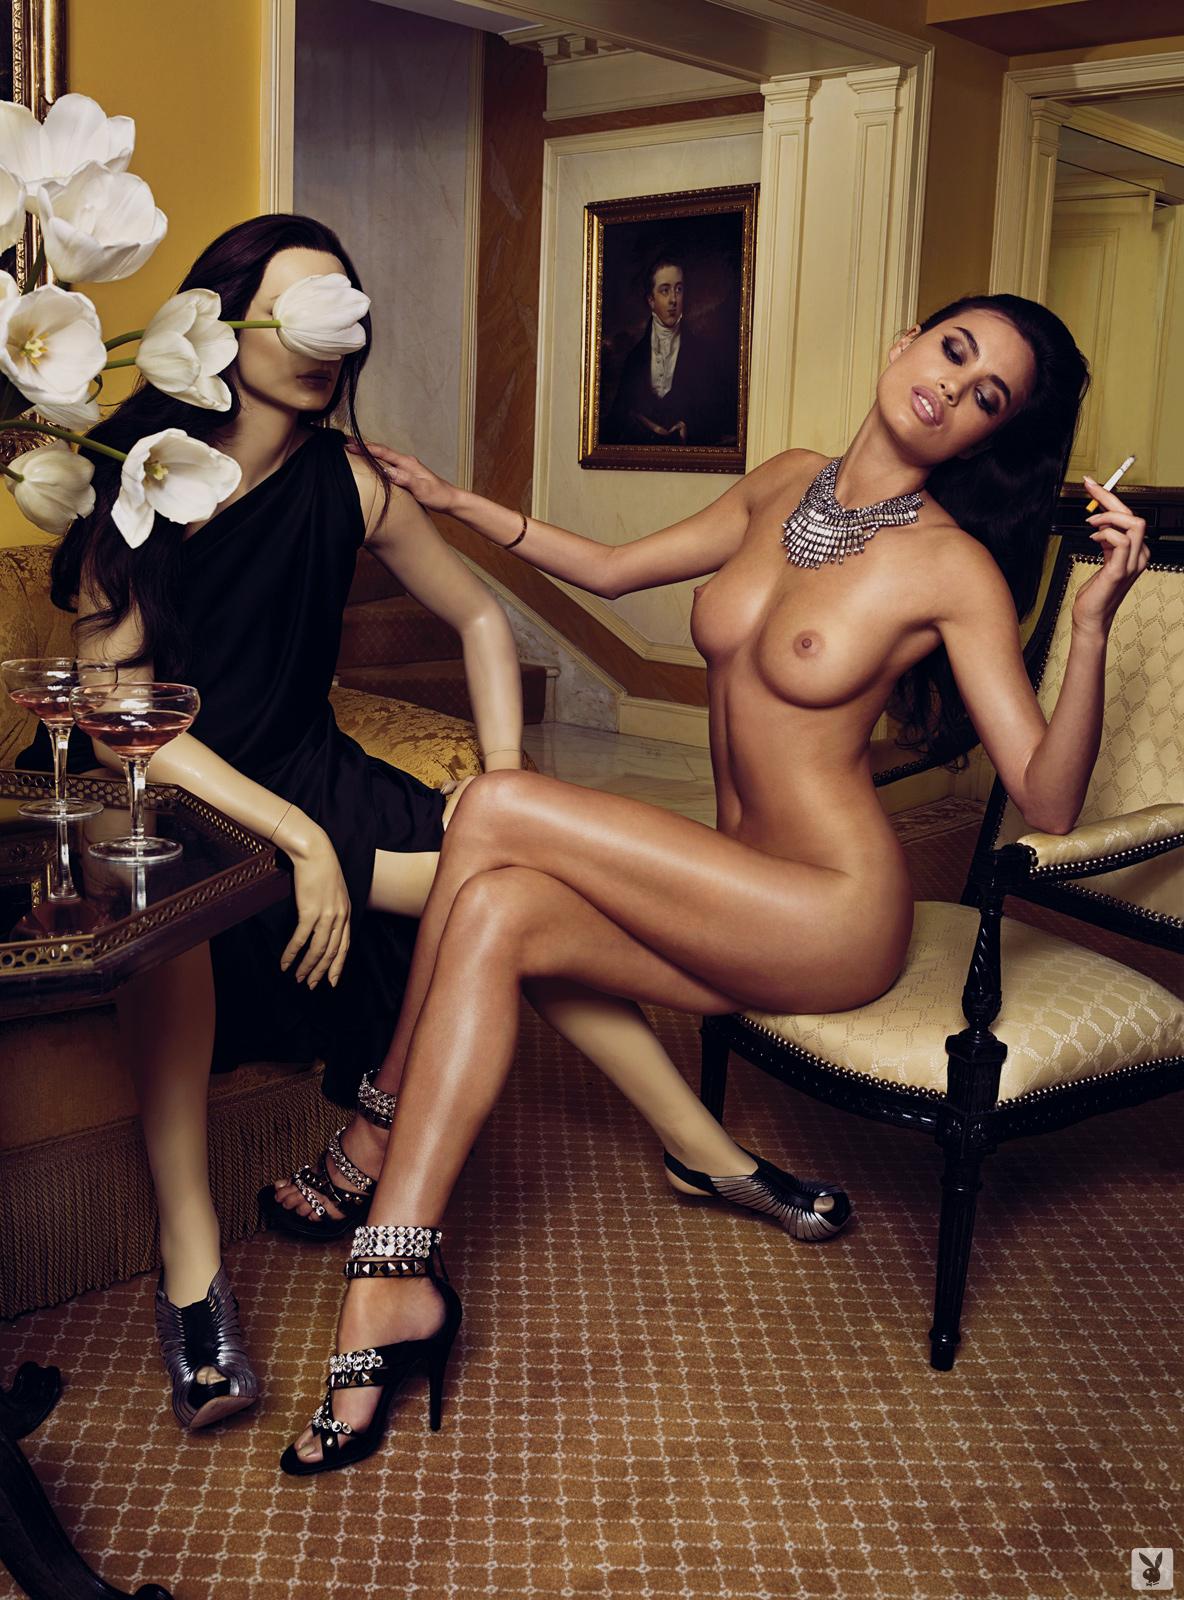 Alina Puscau Nude Pictures. Rating = 8.93/10